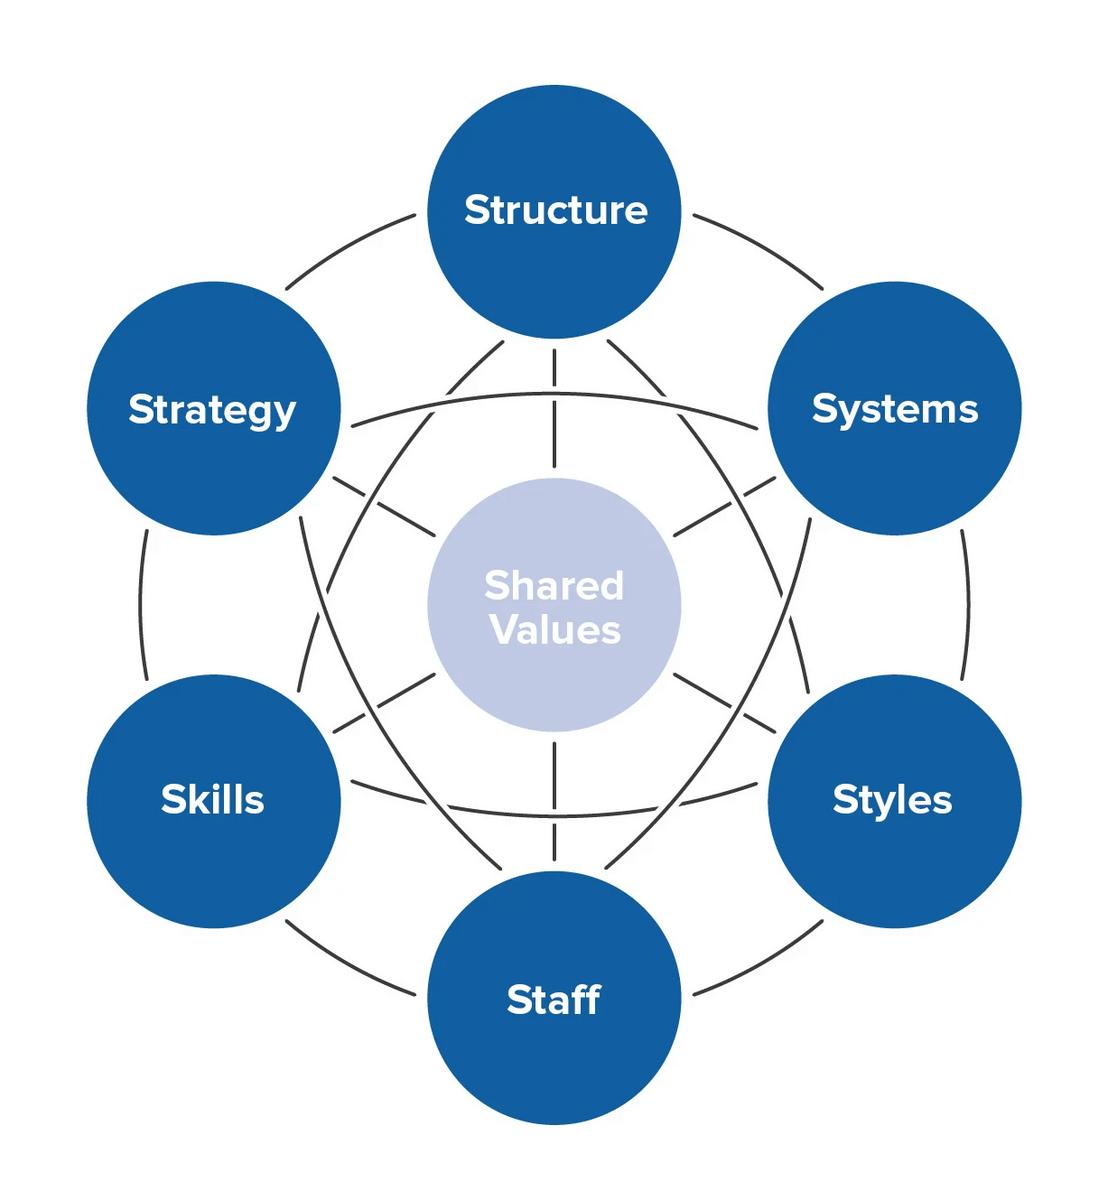 McKinsey 7-S Model of Change